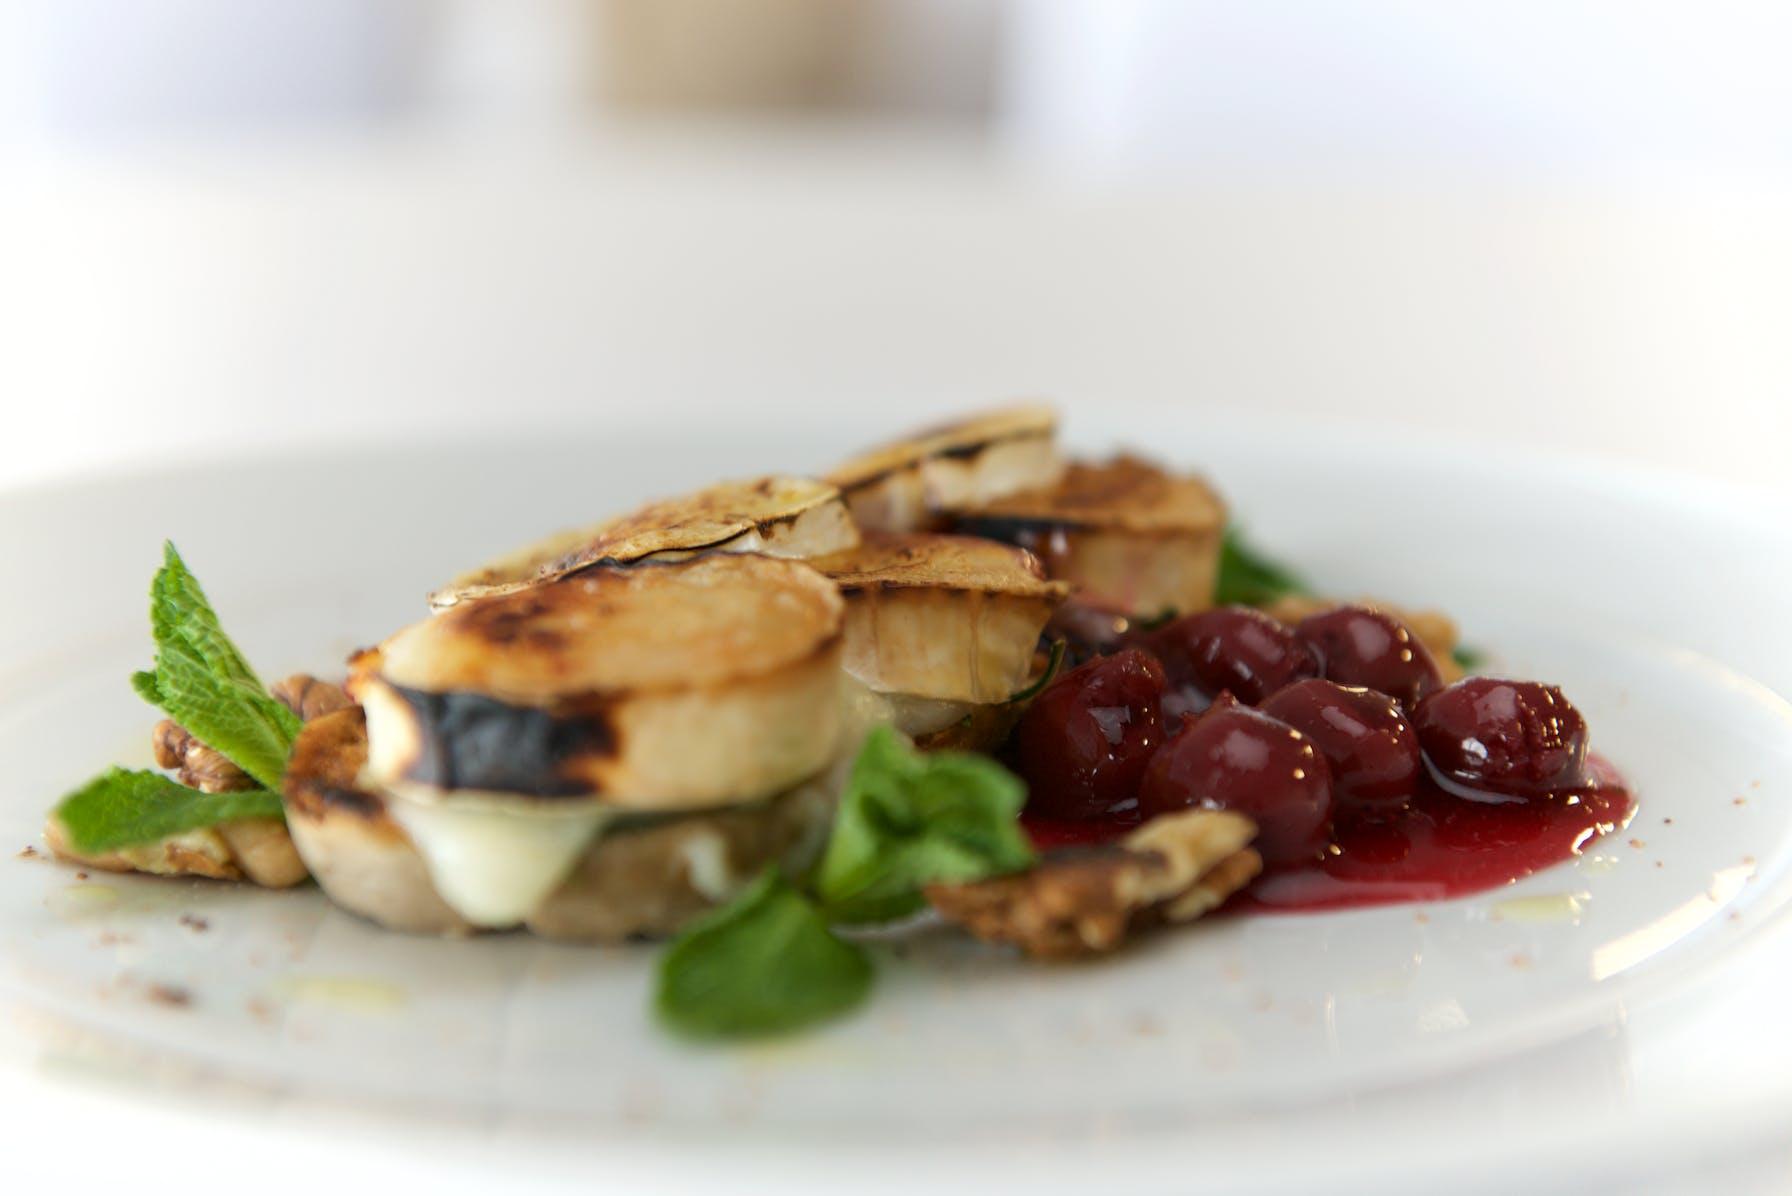 Foto stok gratis daging, Epikur, fotografi makanan, gizi